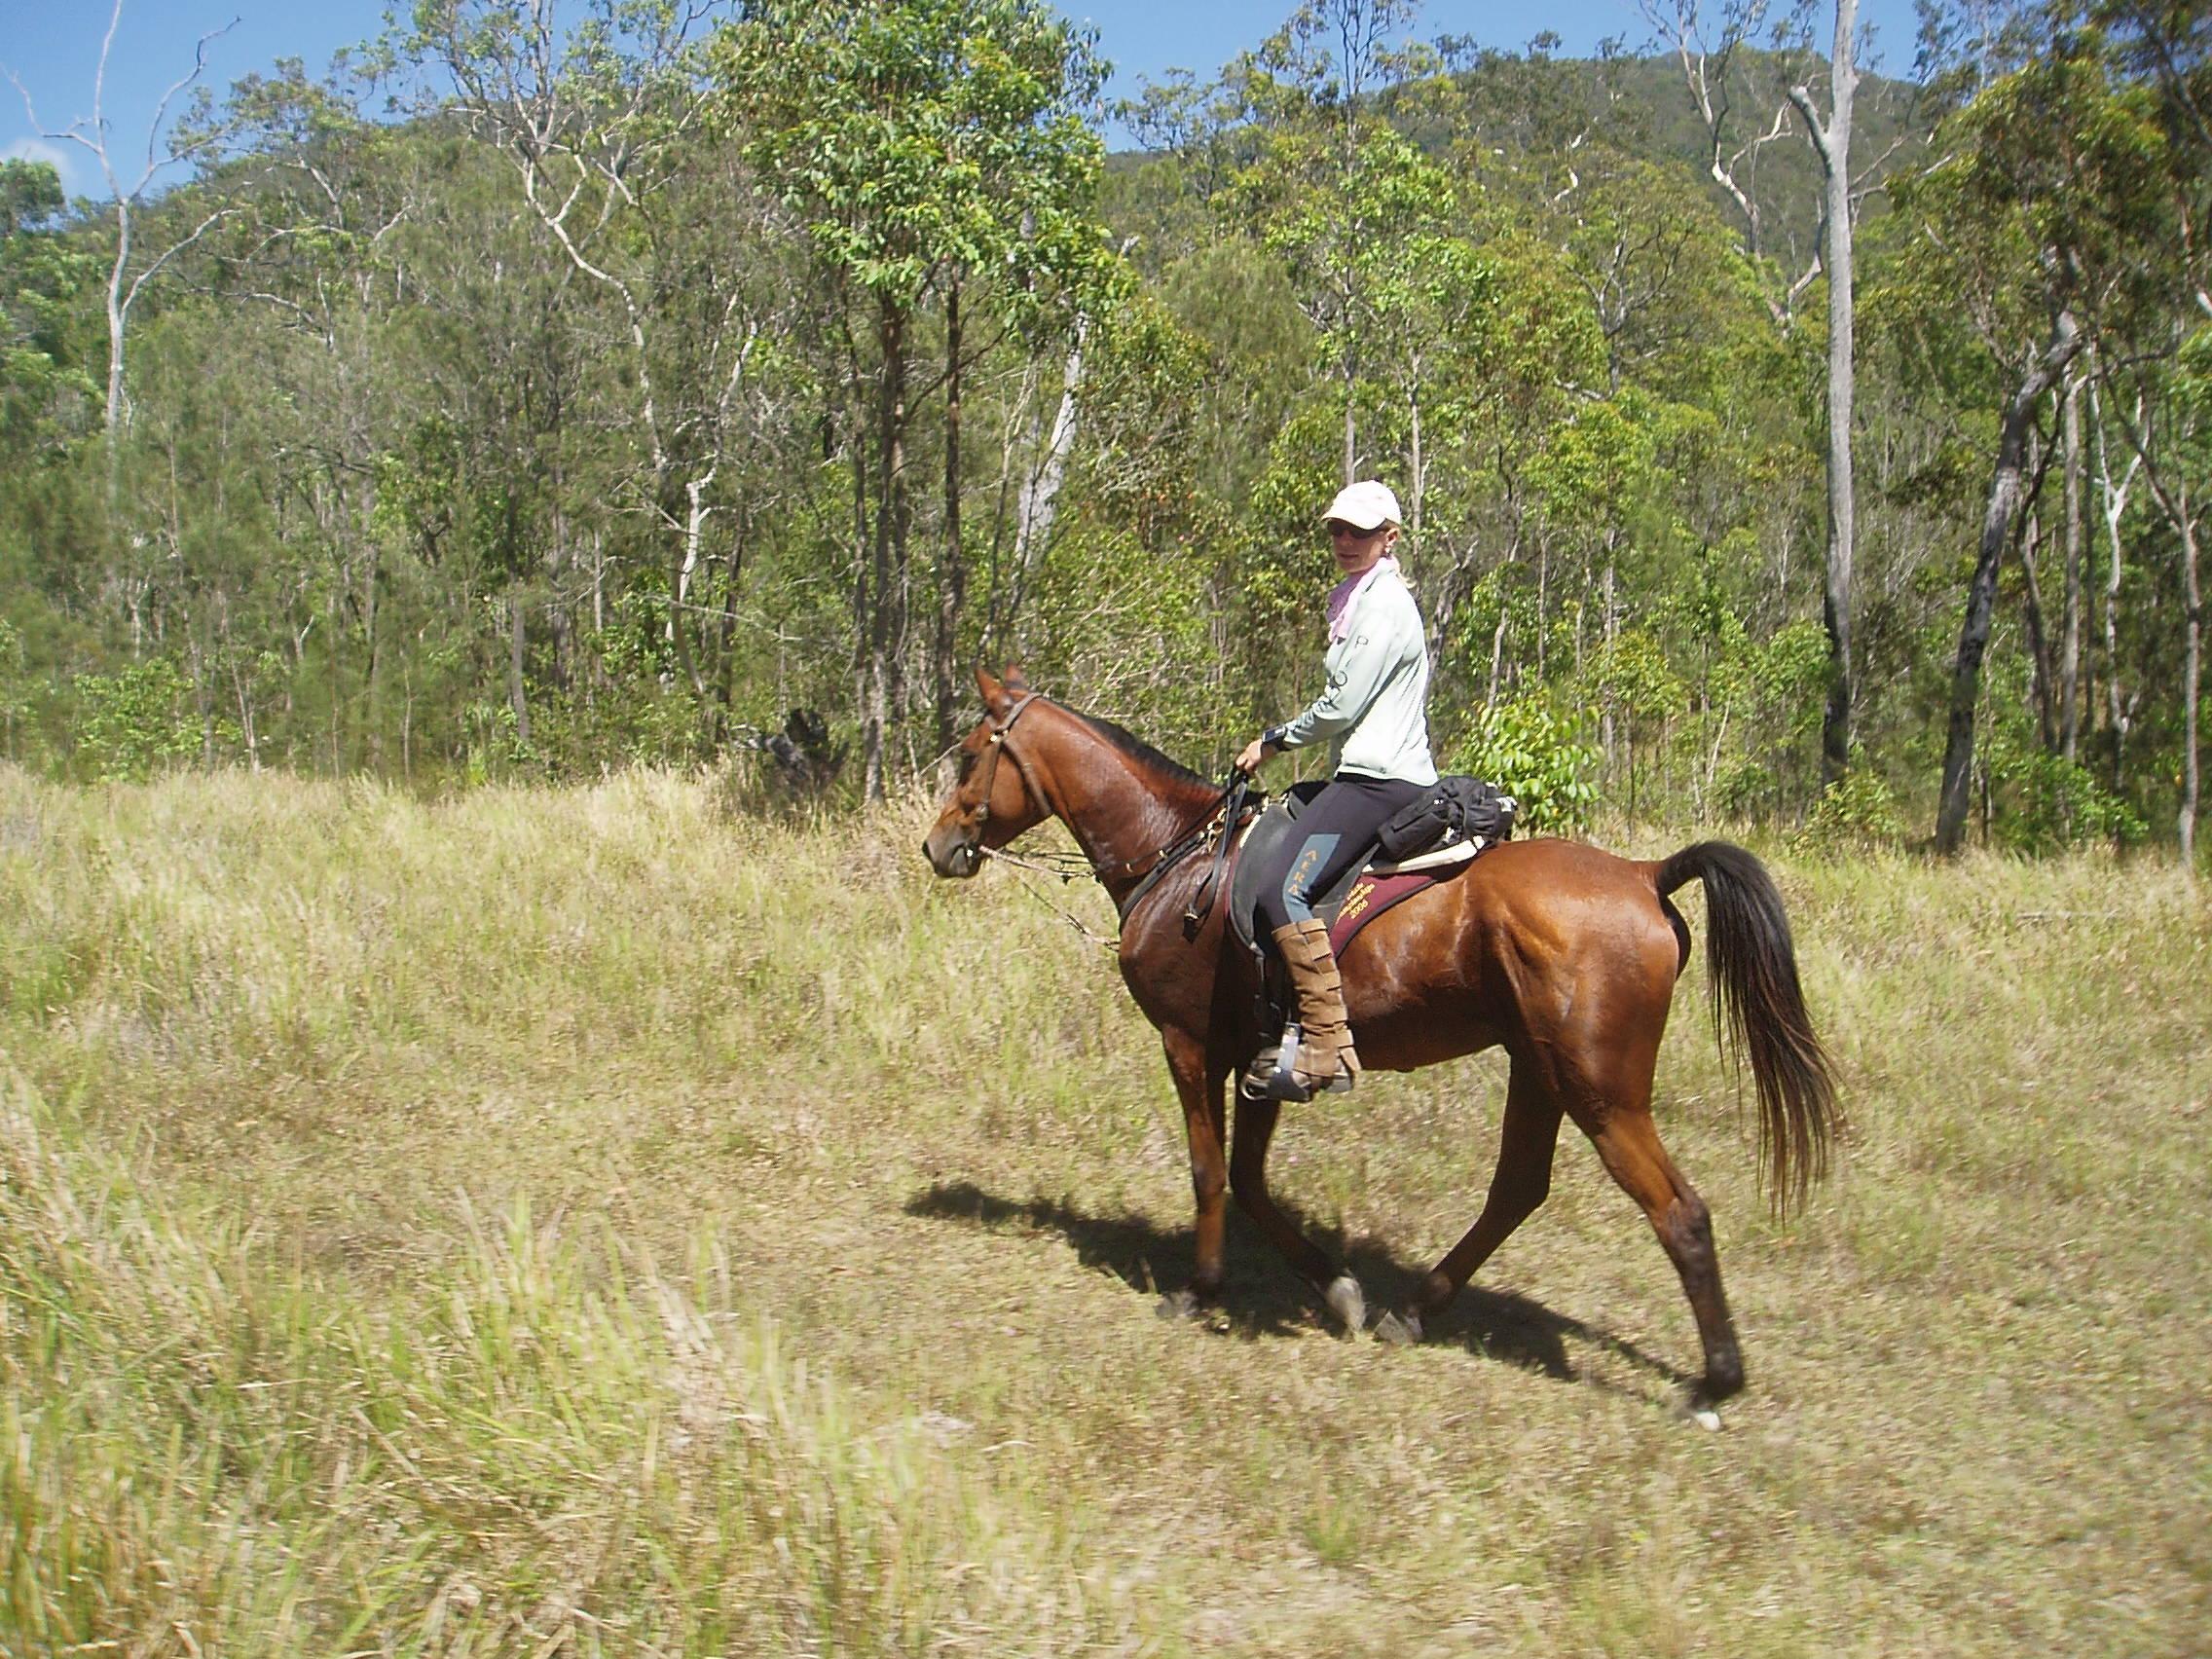 Mellisa Longhurst joined us on her gelding for the challenging Teemburra Dam trailride.